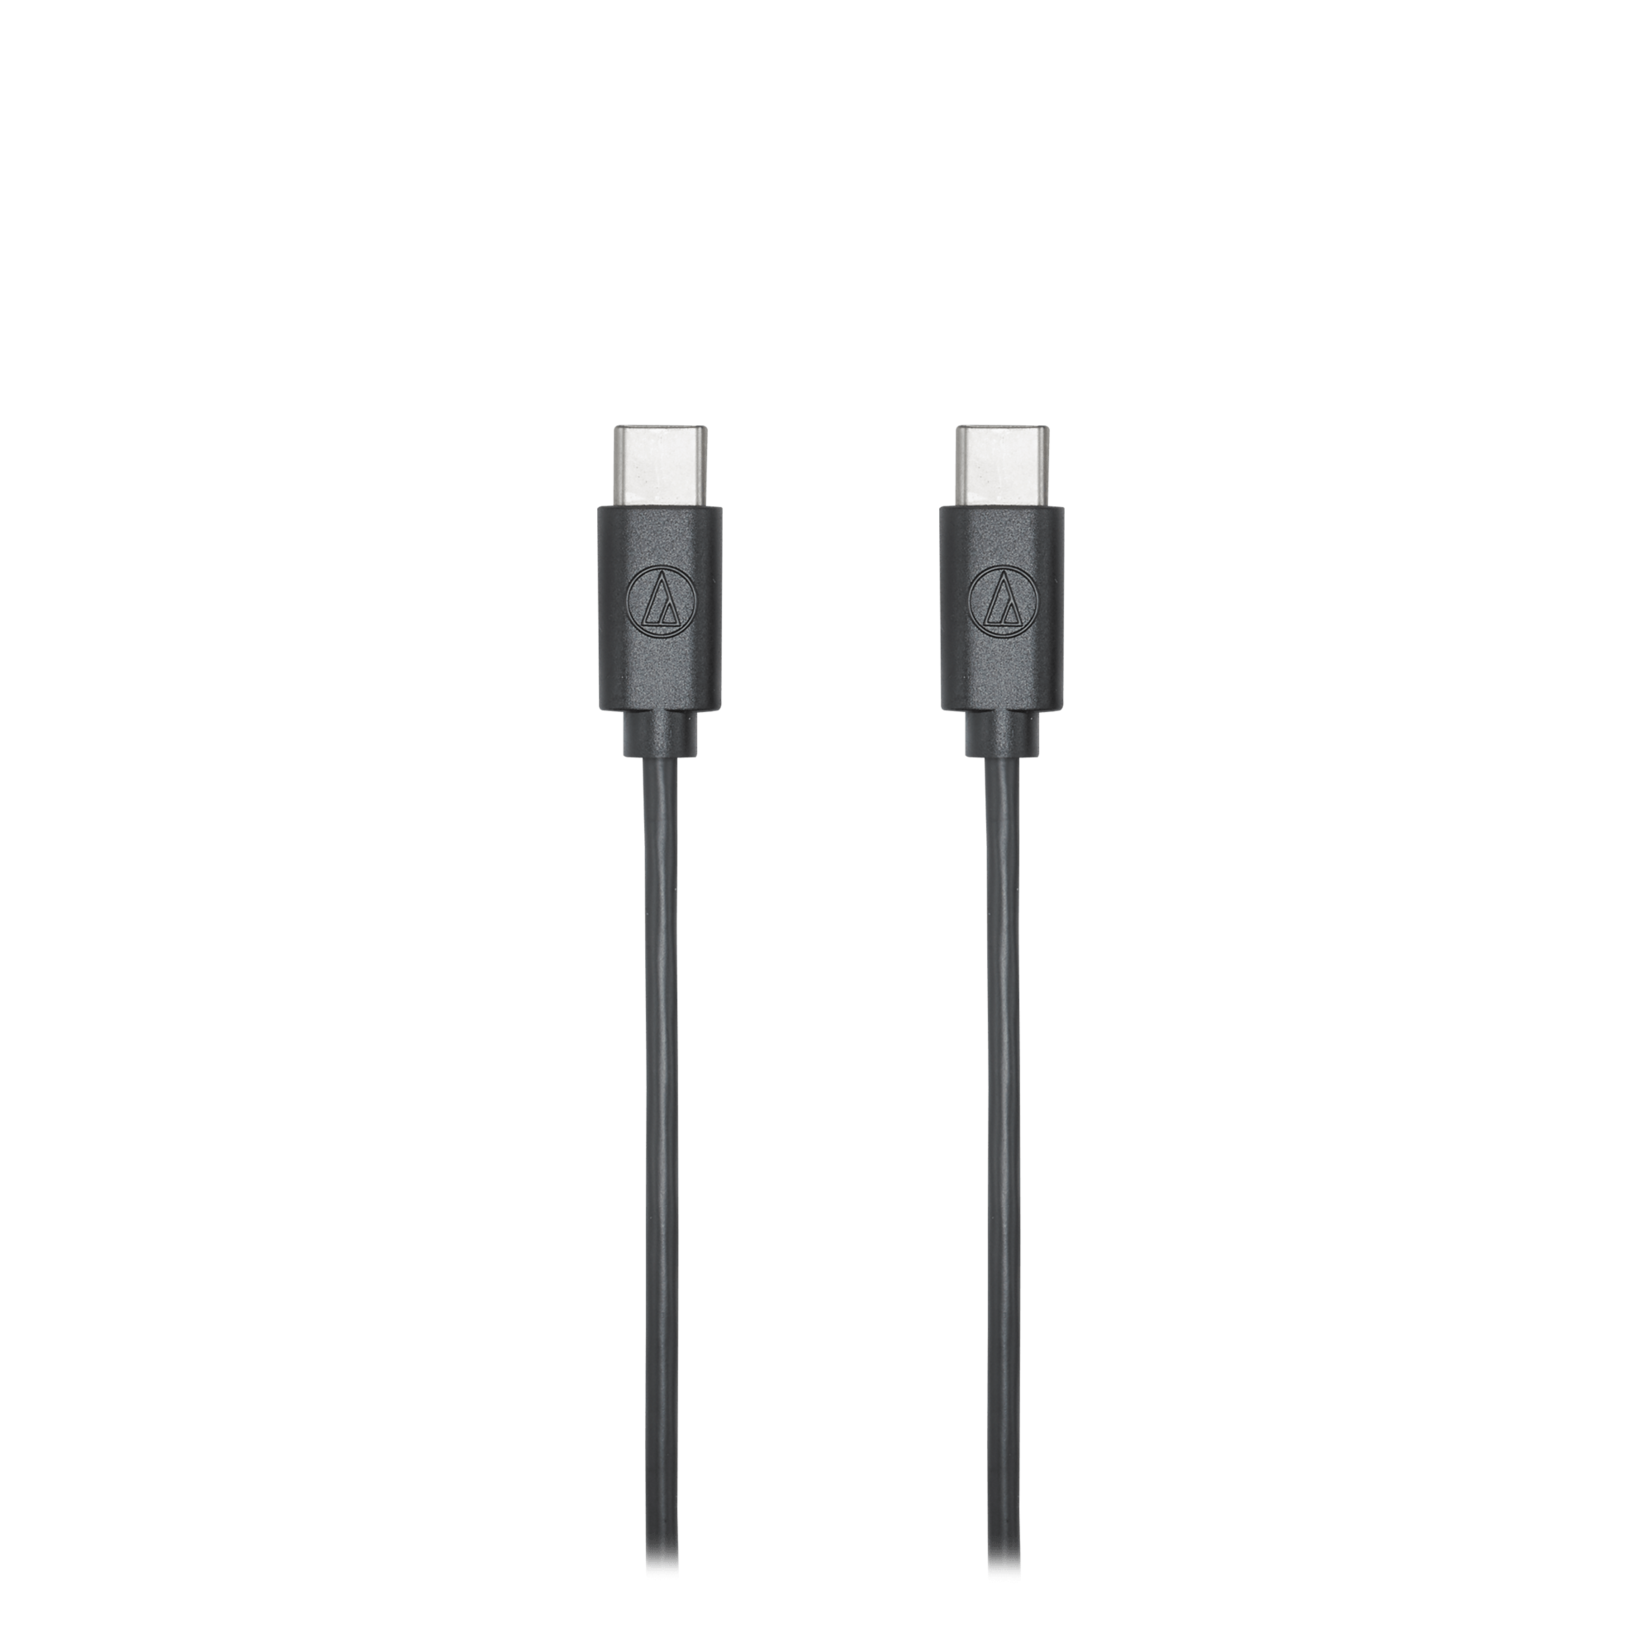 AUDIO-TECHNICA ATR2500X-USB CONDENSER USB MICROPHONE